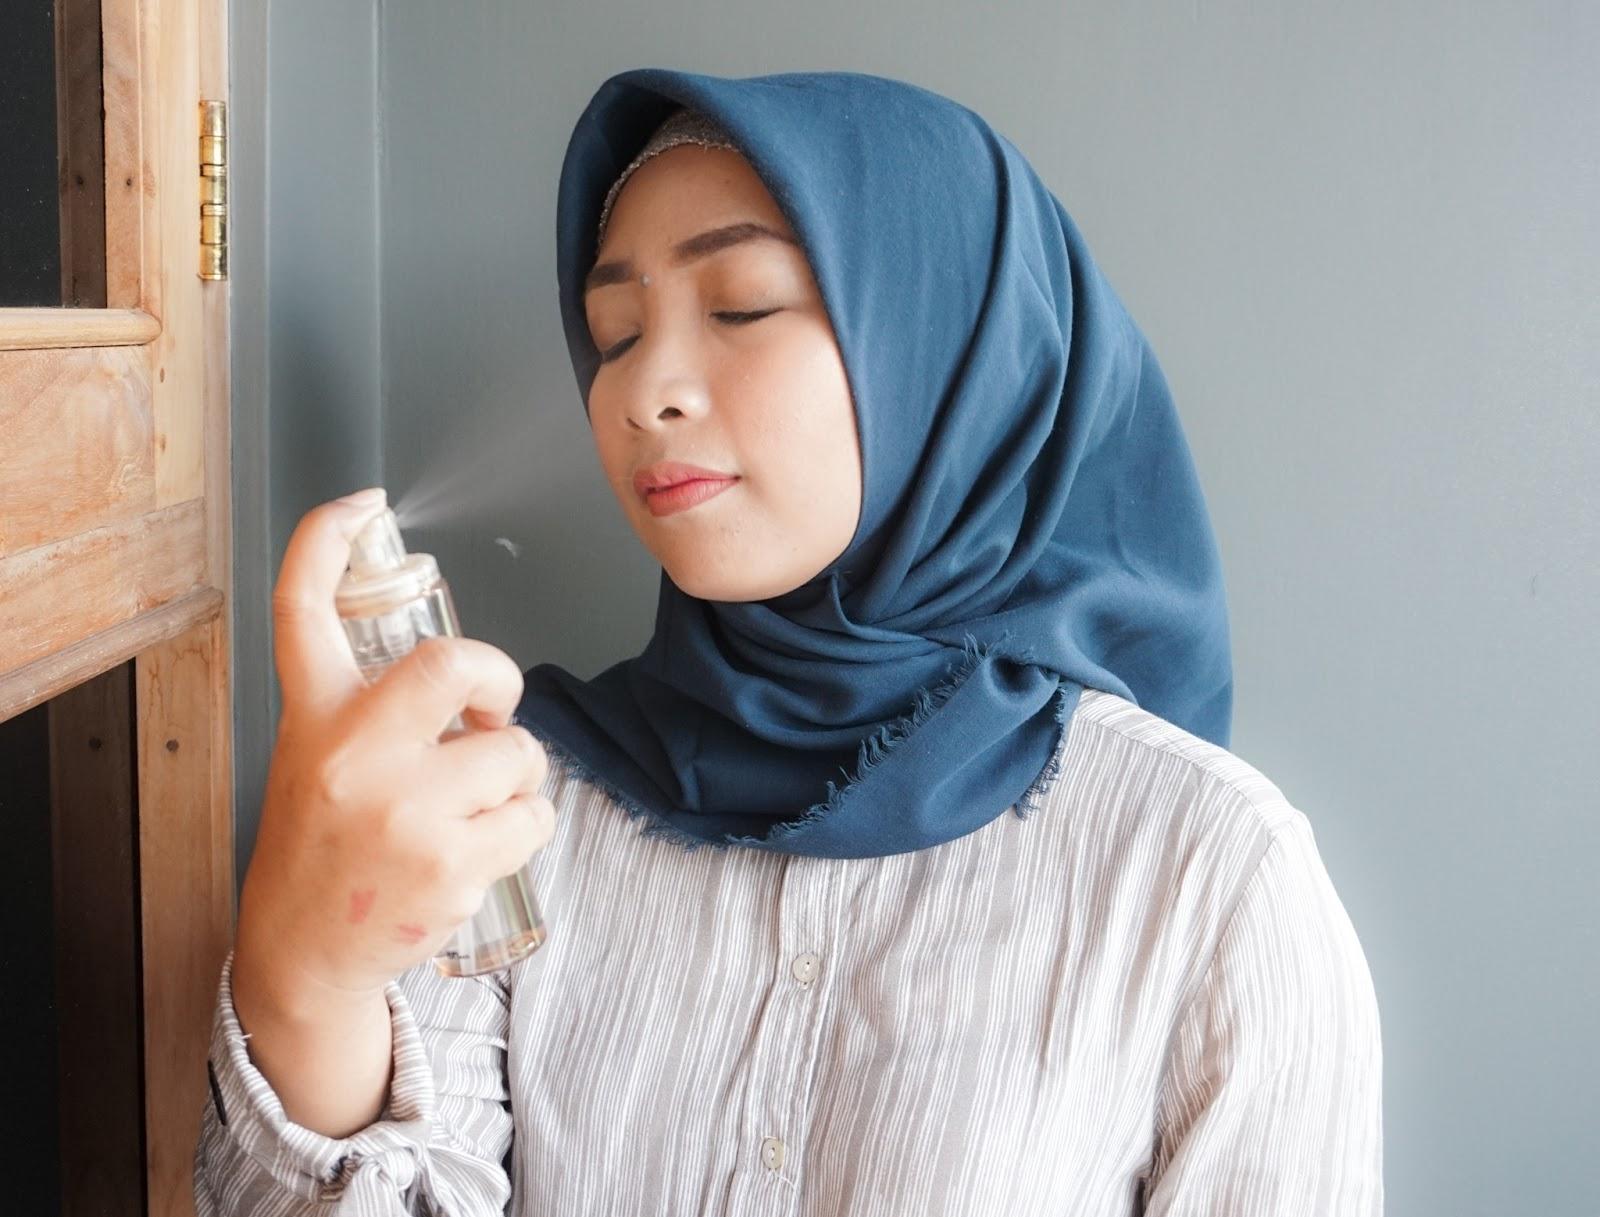 LACOCO ALOE VERA SHOOTING MIST - Lacoco Pelembab, Toner, Pembersih Make Up  - Lacoco Skincare | Lazada Indonesia